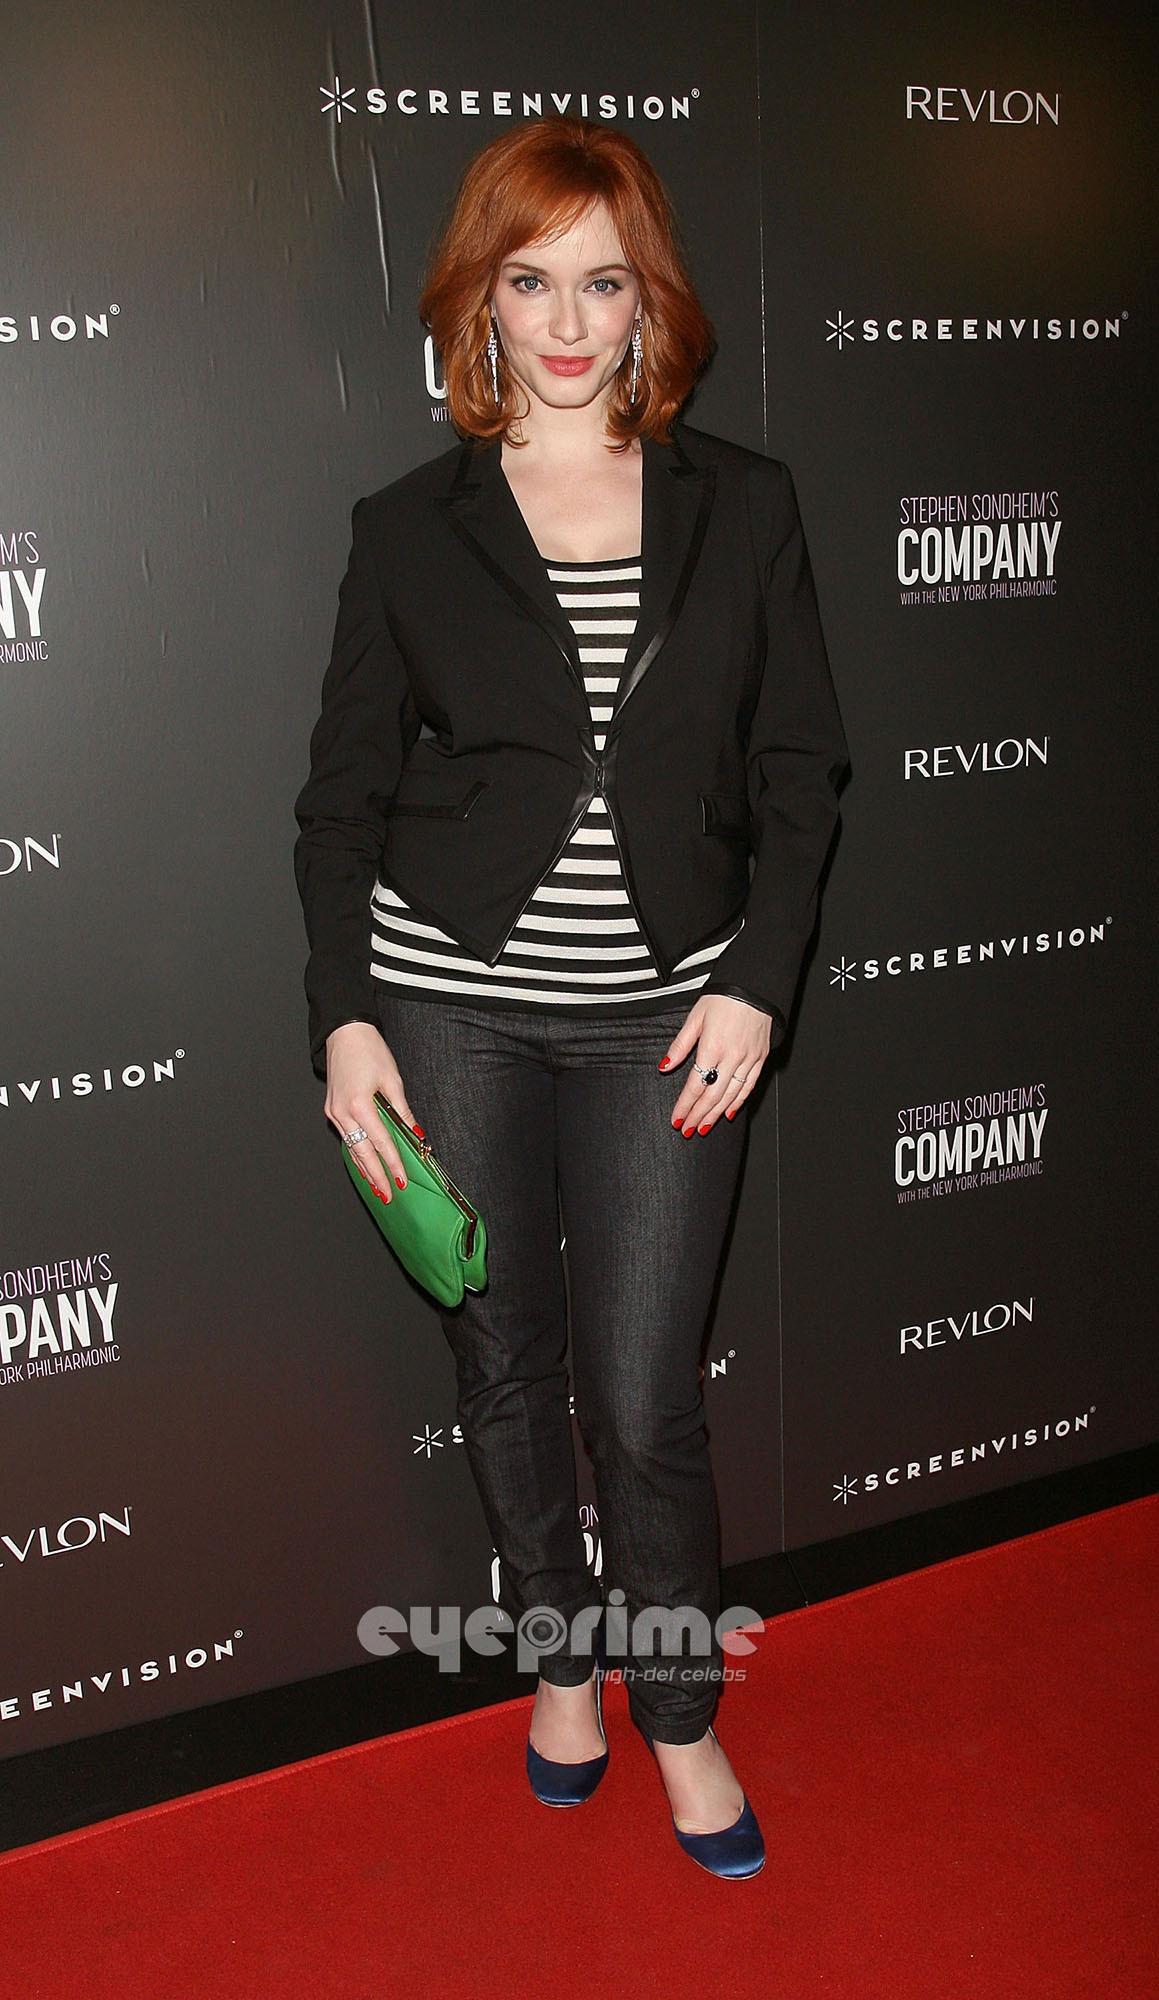 'The Company' New York Premiere